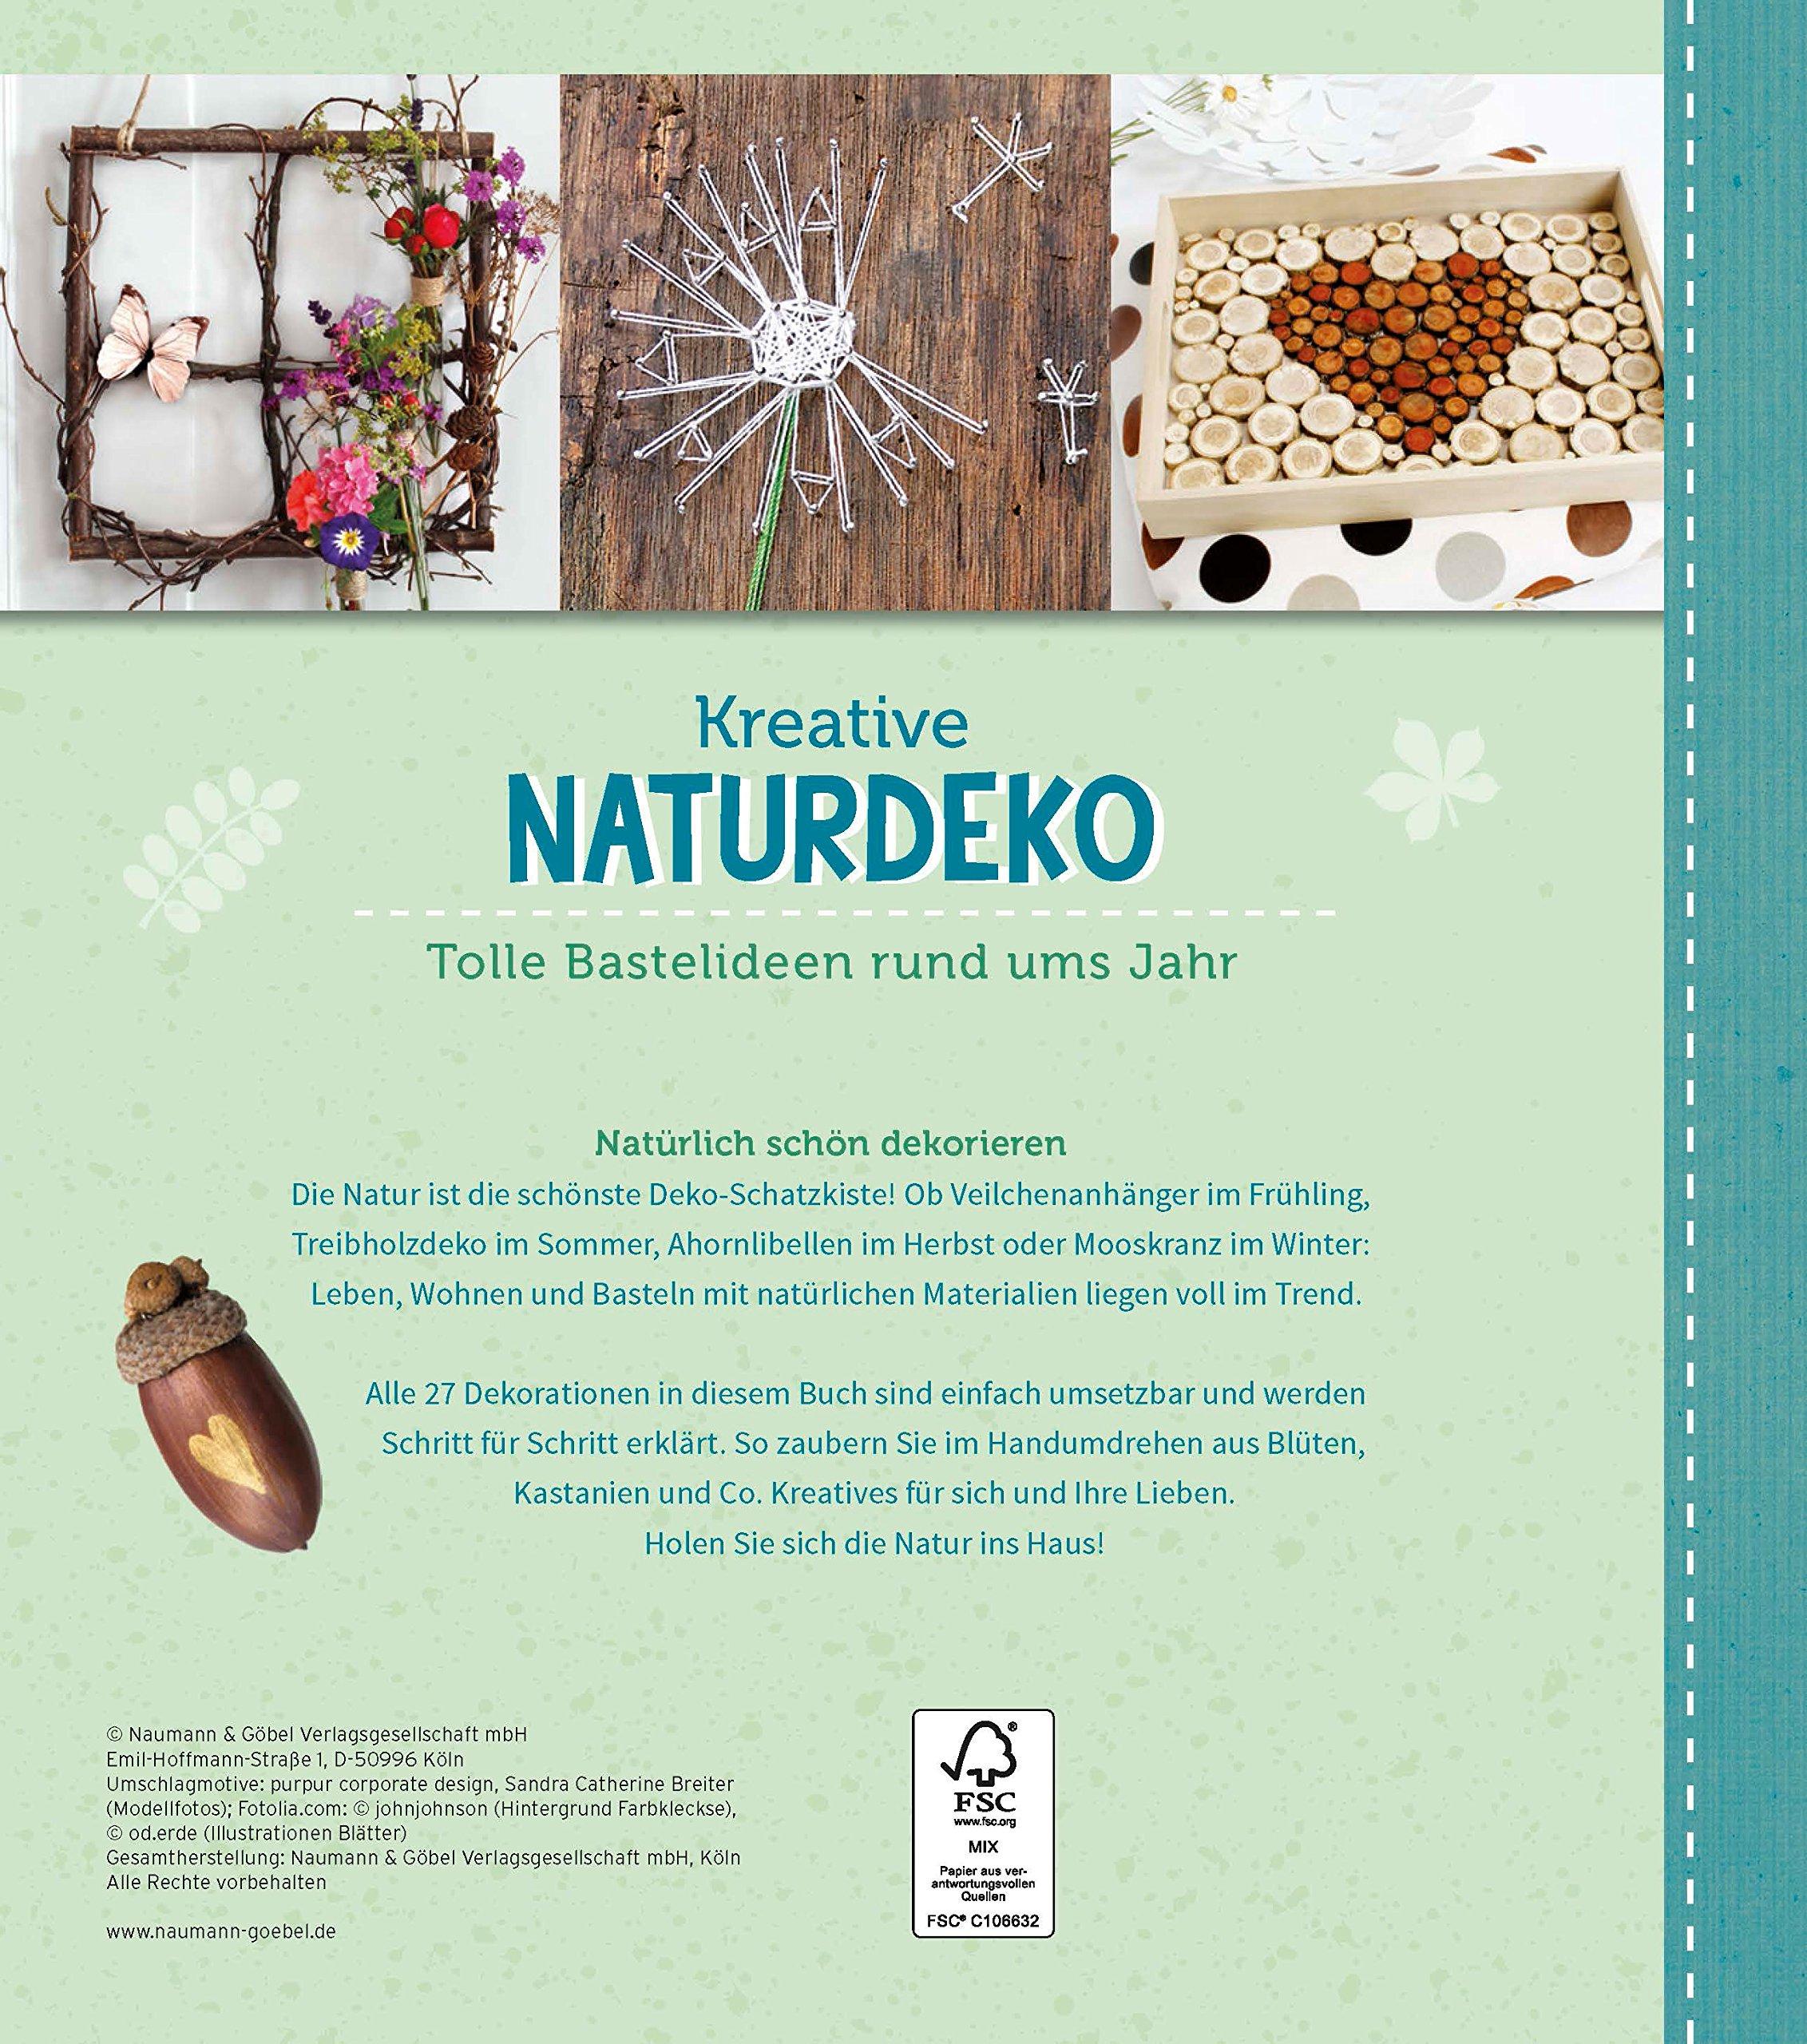 Naturdeko Holz Inspirierend Kreative Naturdeko Amazon Books